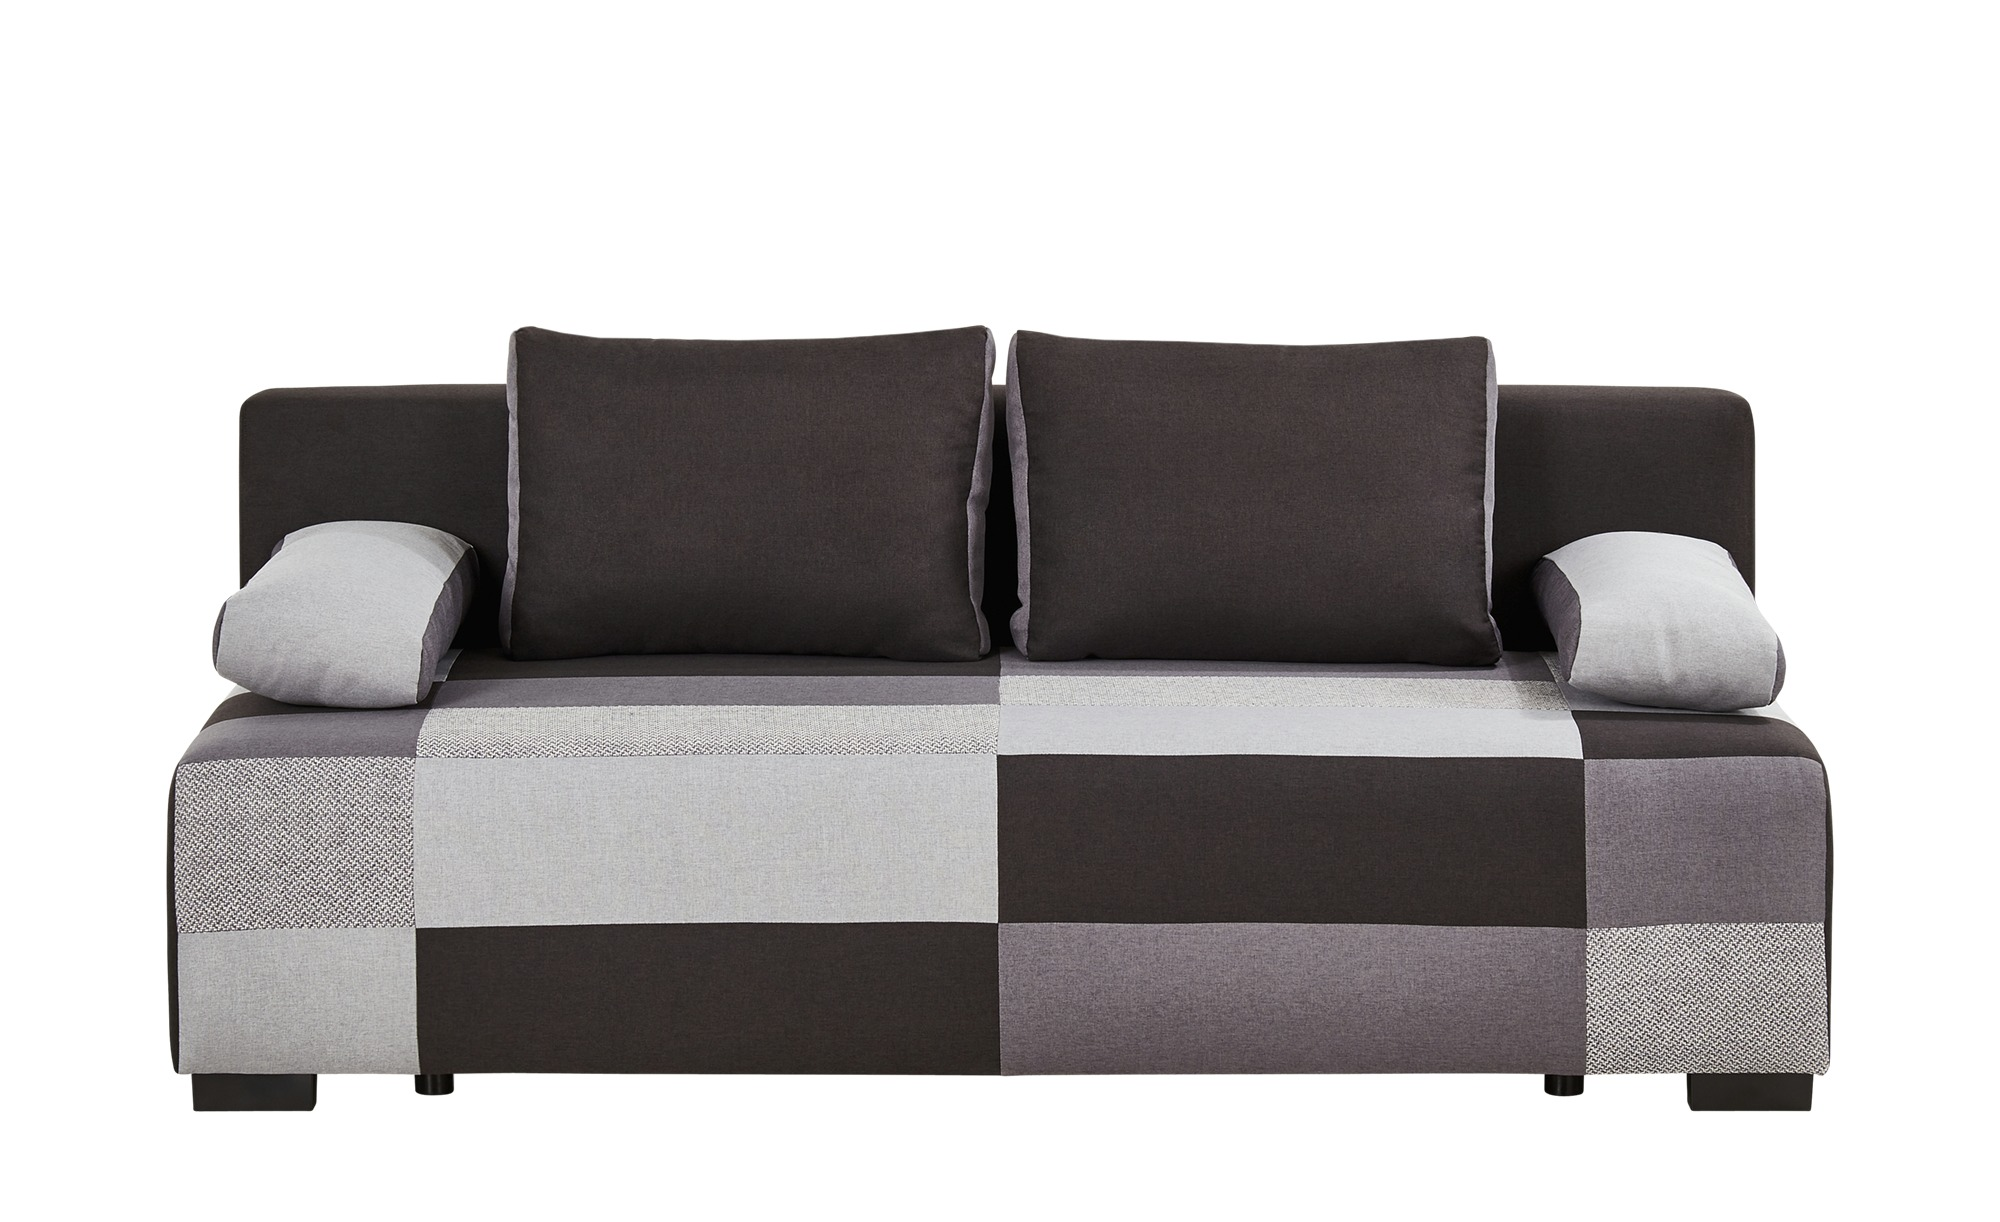 Schlafsofa schwarz/grau - Flachgewebe Jamira ¦ grau ¦ Maße (cm): B: 204 H: 90 T: 92 Polstermöbel > Sofas > 2-Sitzer - Höffner